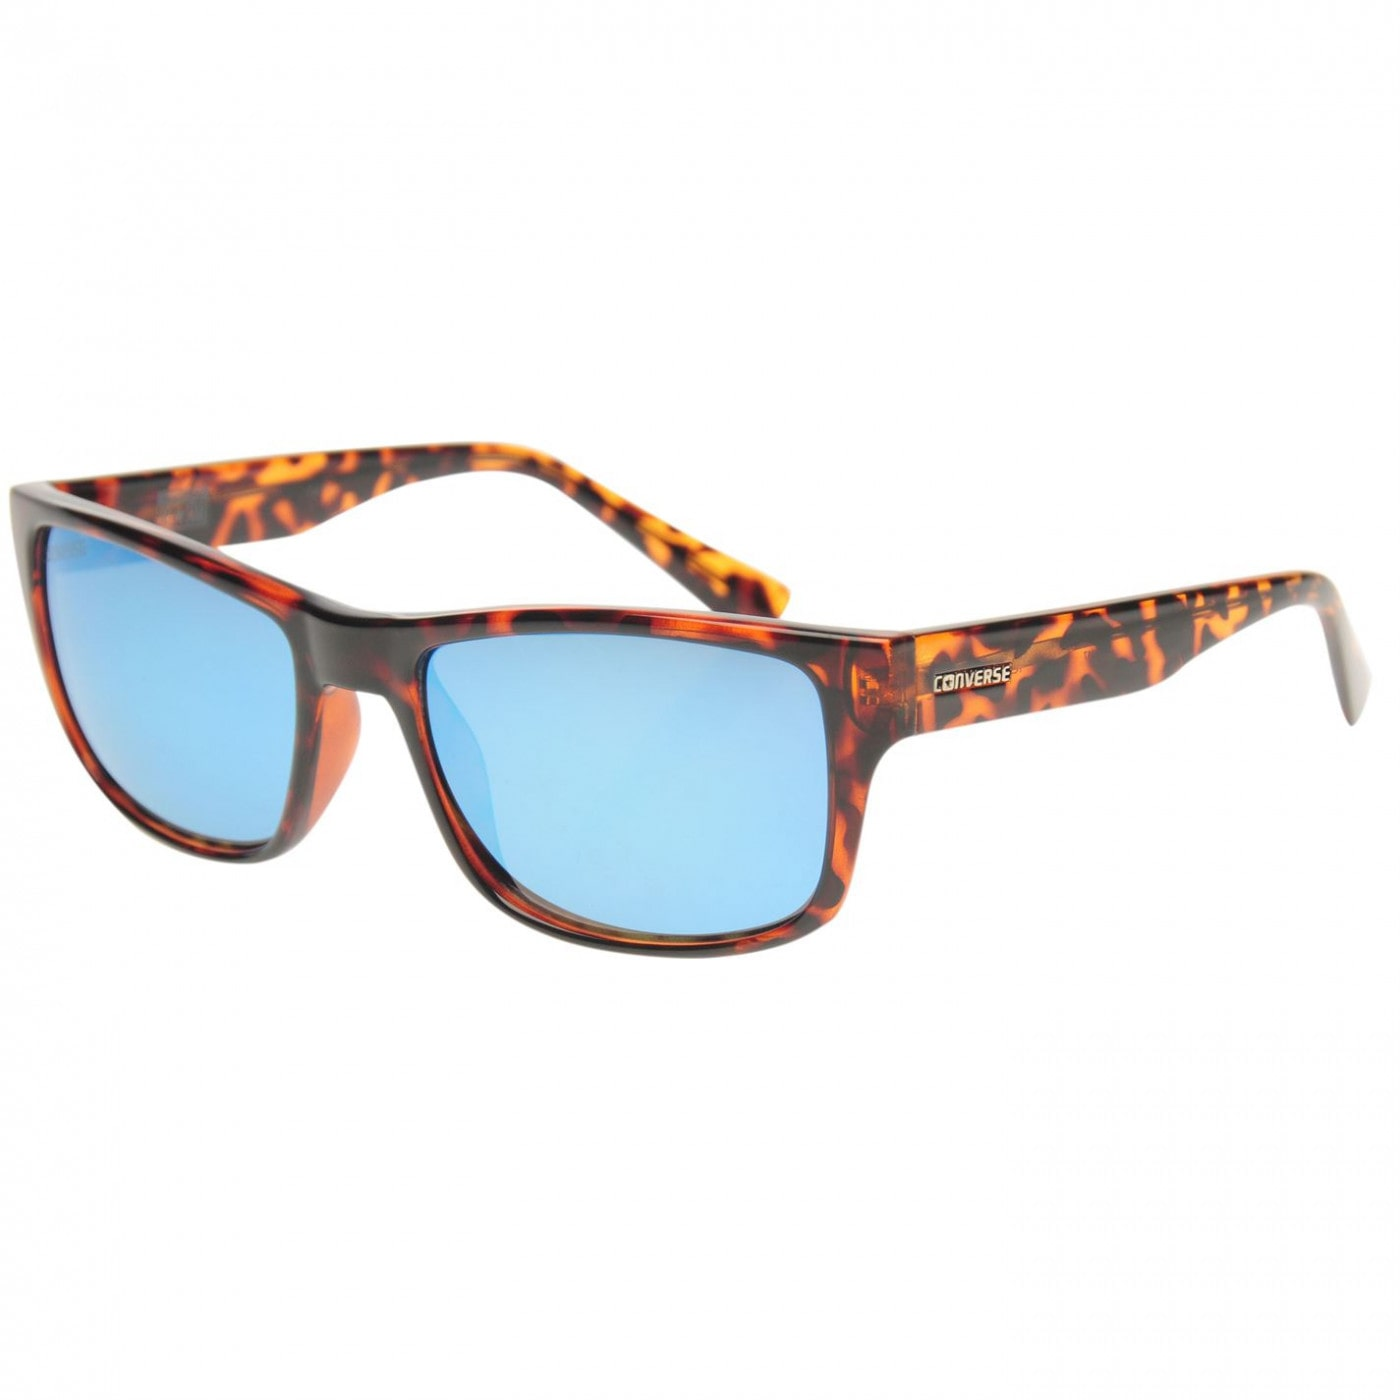 Converse B017 Sunglasses